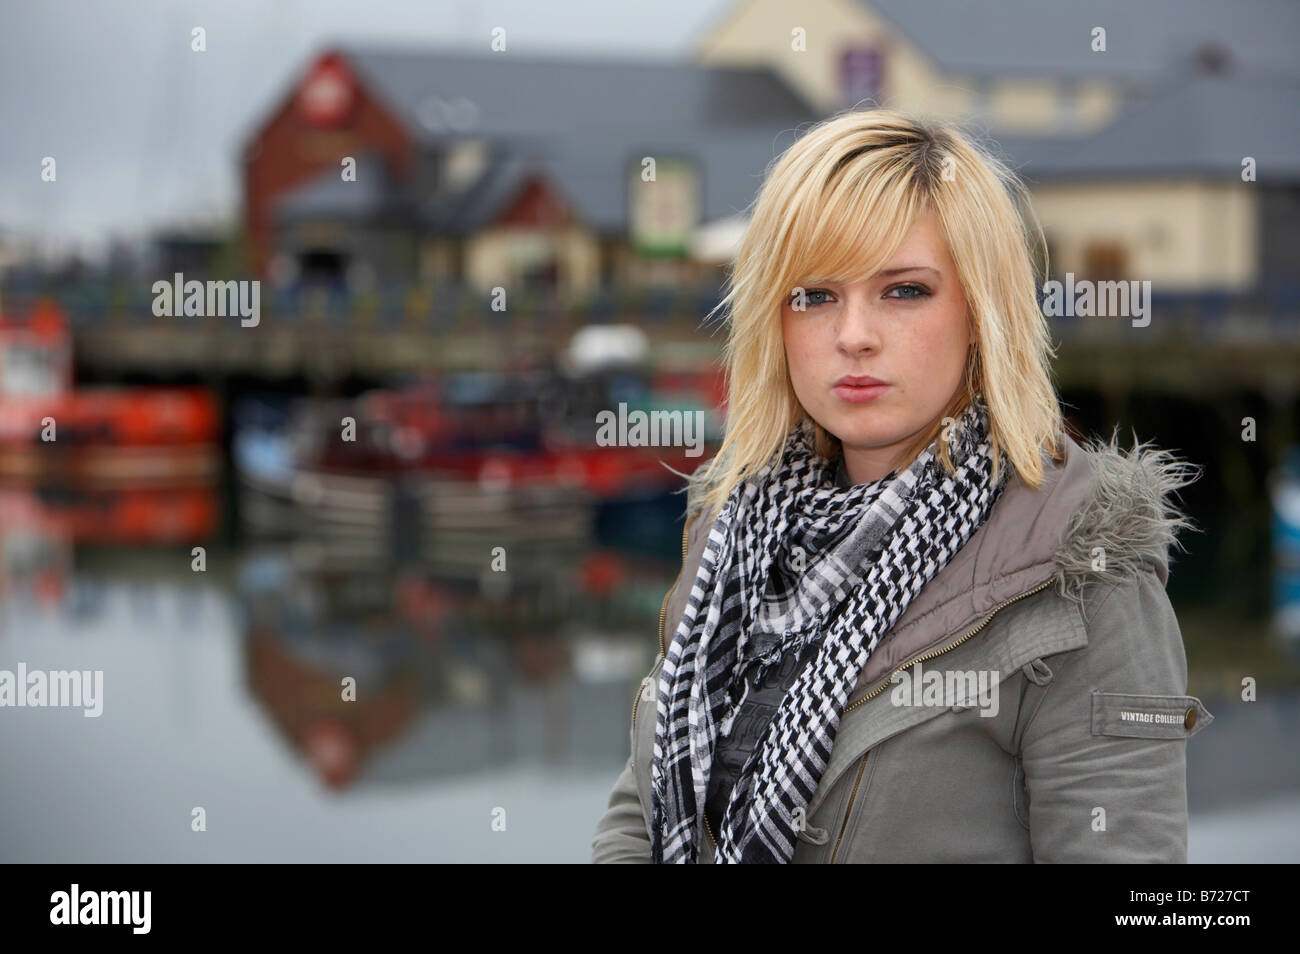 blonde 18 year old girl stock photos & blonde 18 year old girl stock